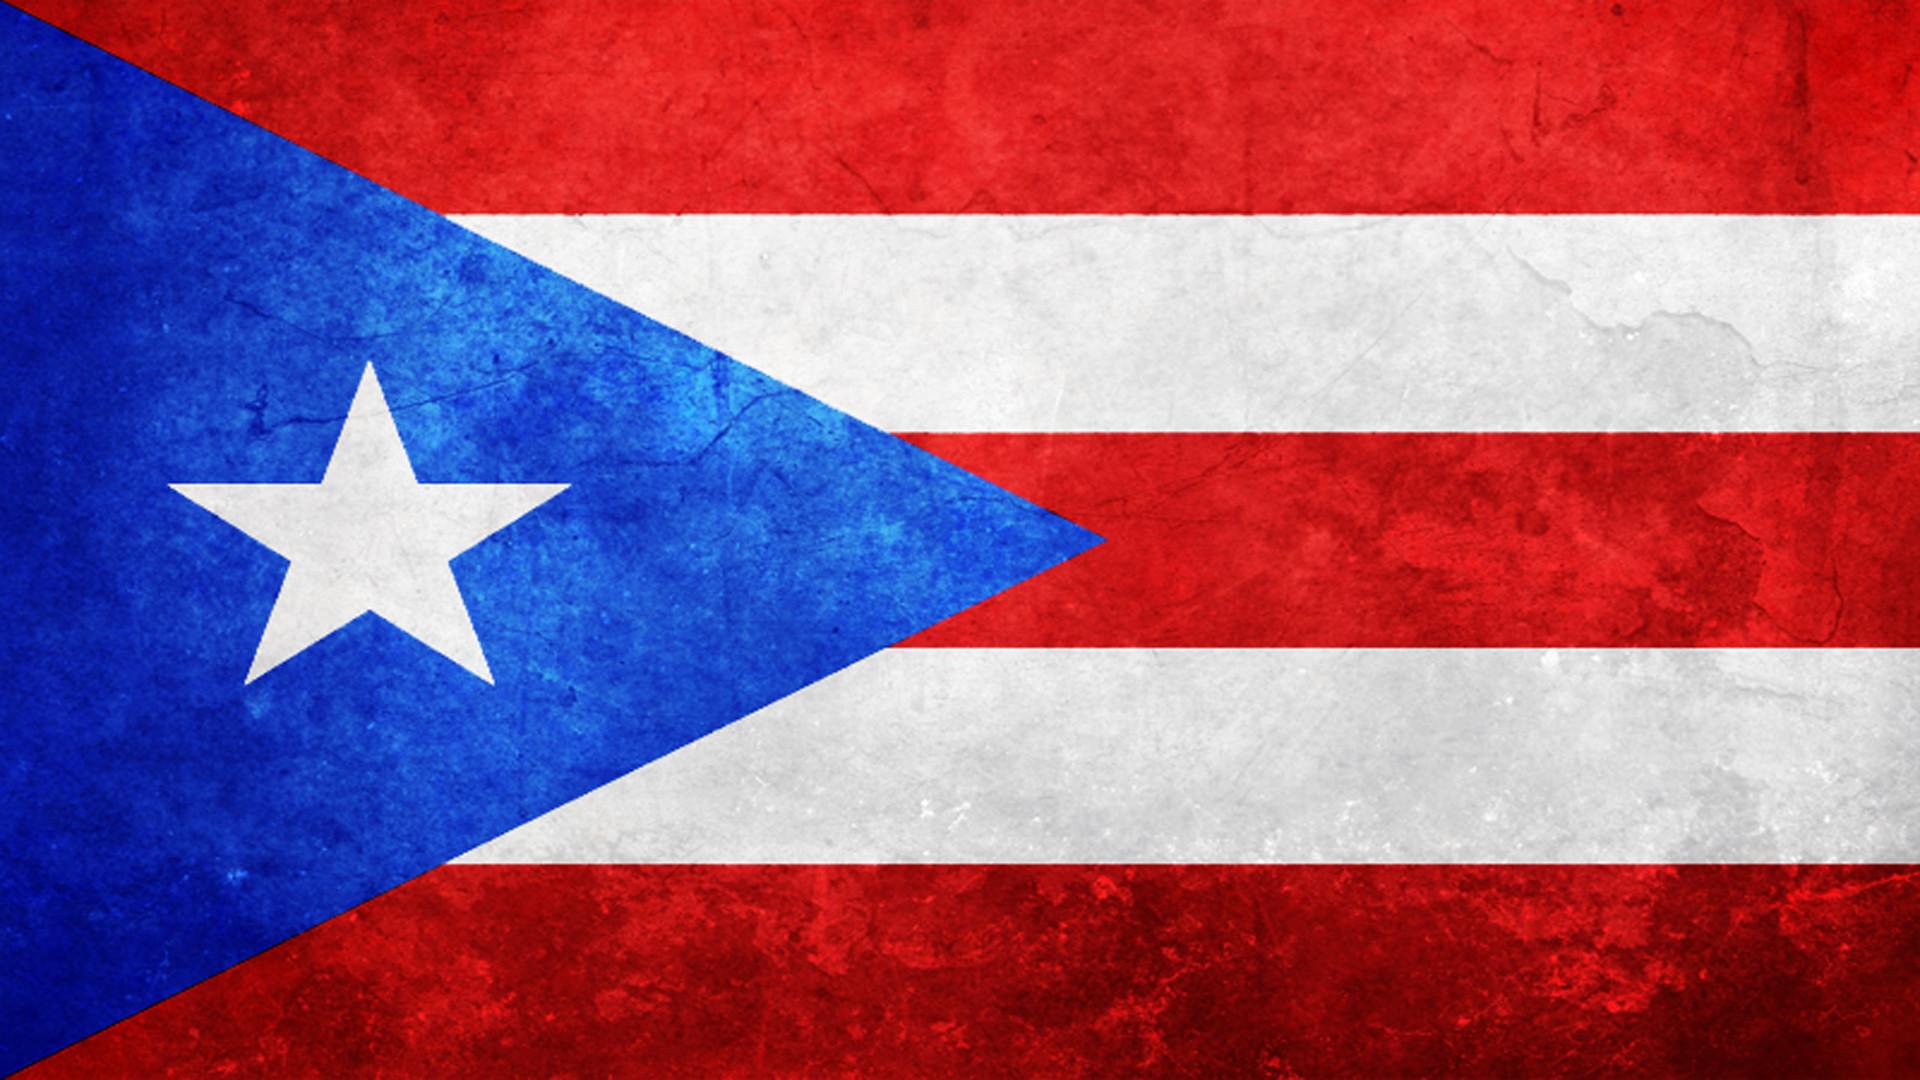 Flag Of Puerto Rico Puerto Rico Flag Wallpaper   Data-src - Puerto Rican Flag 1080 - HD Wallpaper